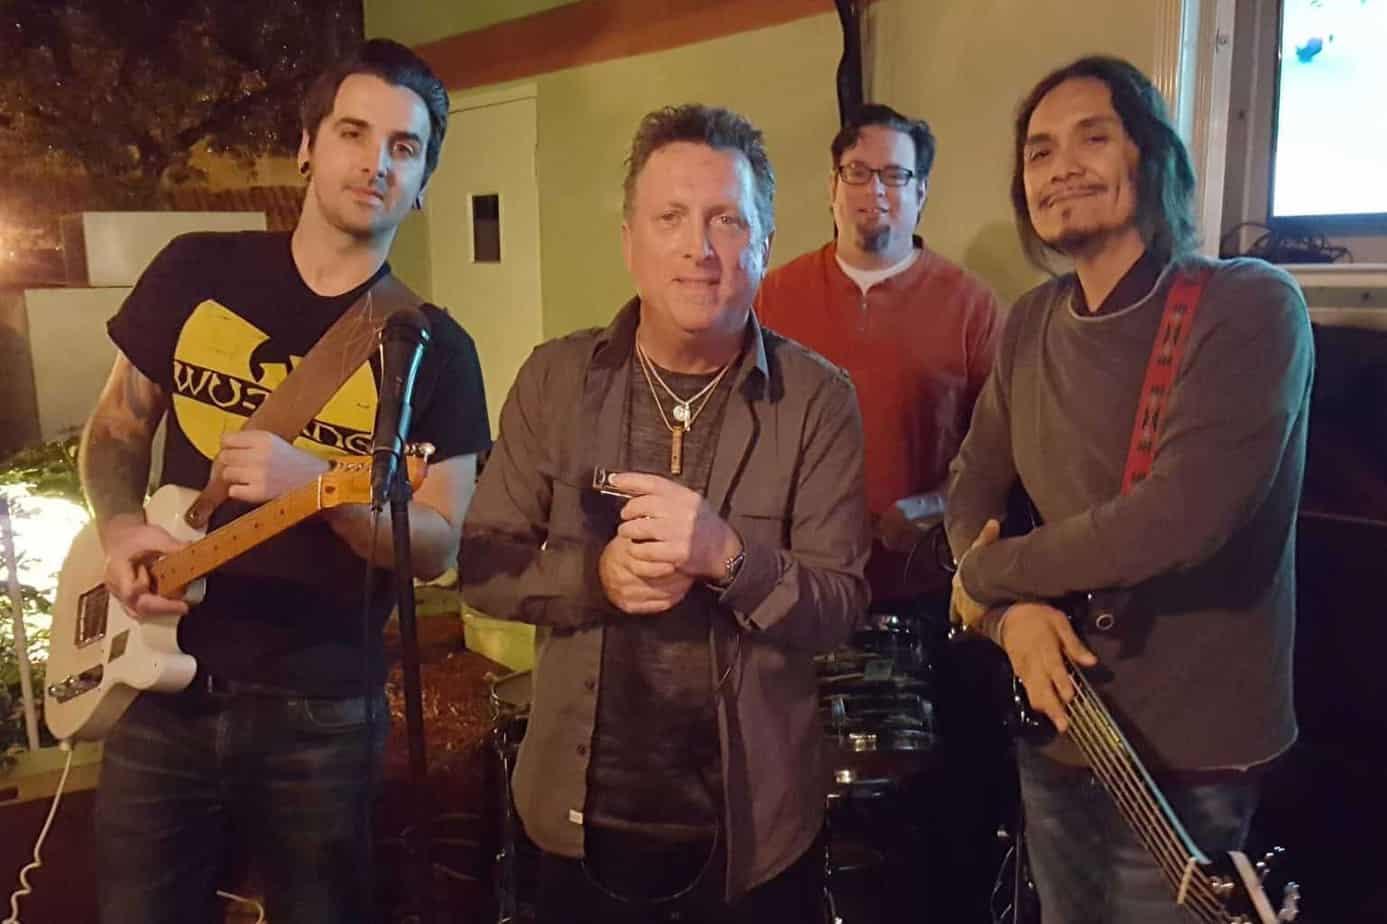 The Rockin' Jake Band at Crawdaddy's